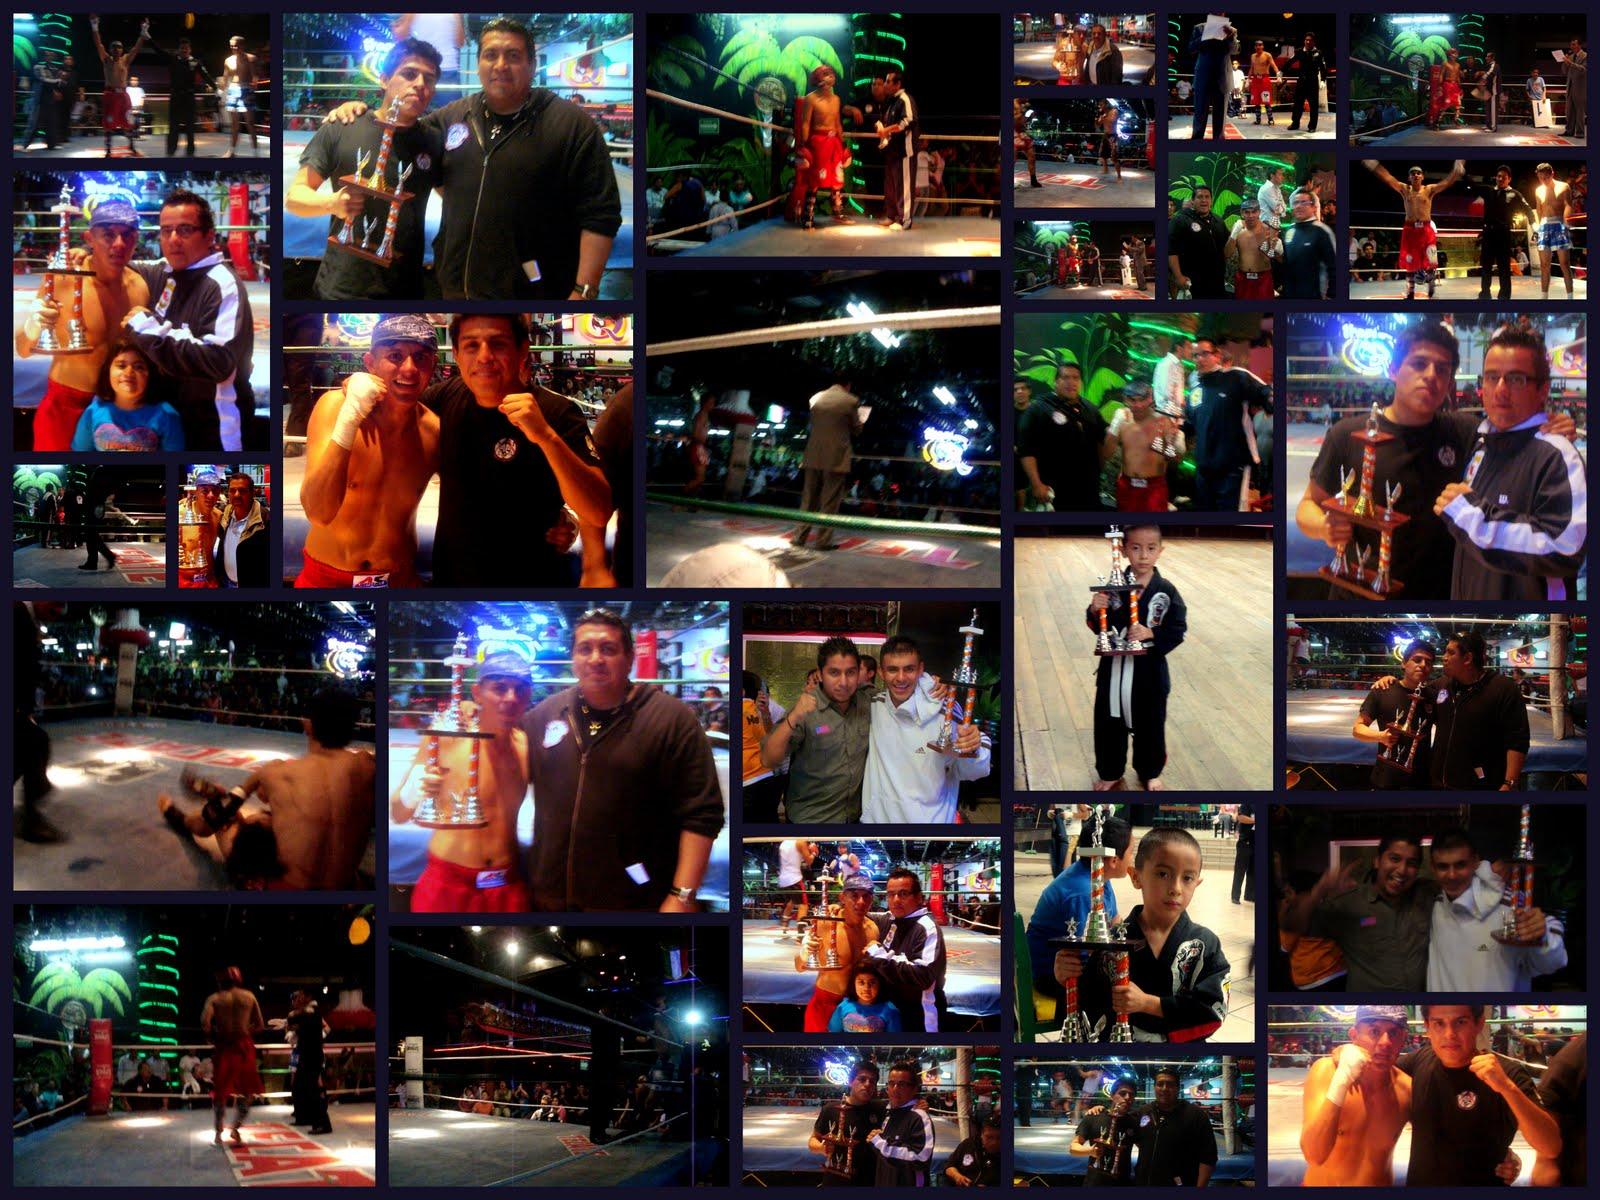 http://4.bp.blogspot.com/_z7thxQBOSjA/TI5kfd1Gi8I/AAAAAAAAACM/MDWVh0twAlo/s1600/peleas+11+sep.jpg